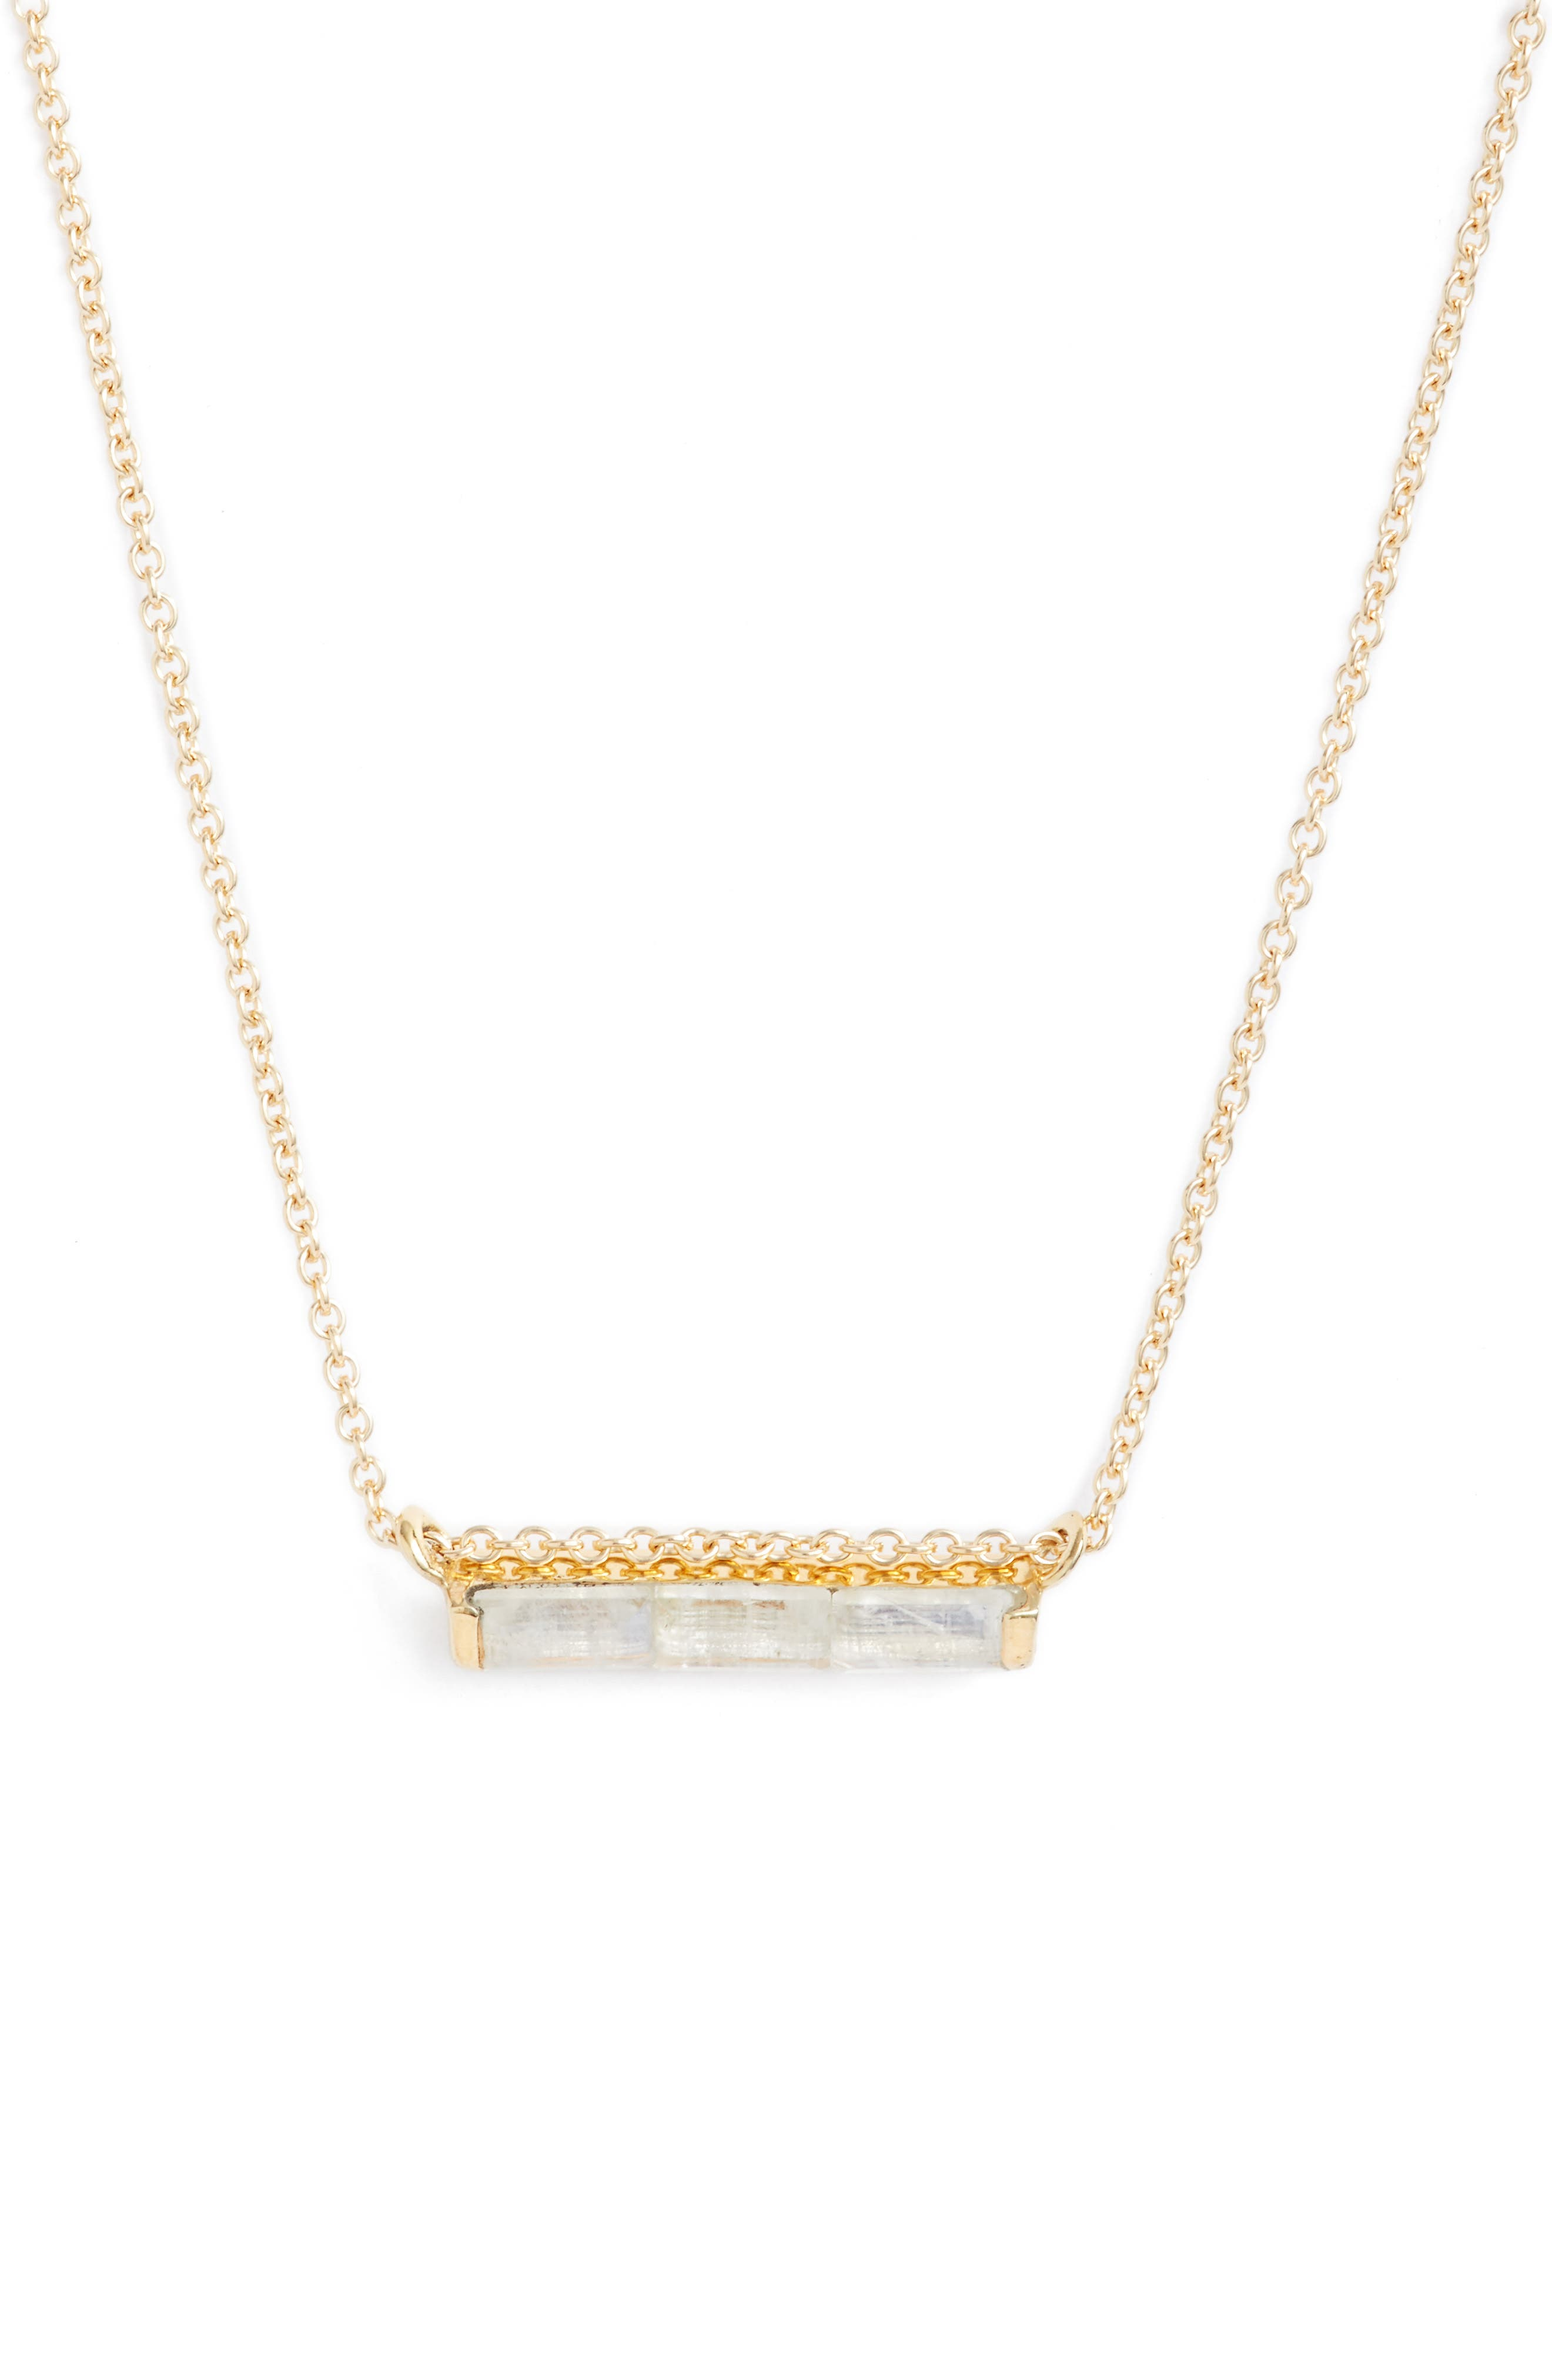 Channel Set Semiprecious Stone Necklace,                             Main thumbnail 3, color,